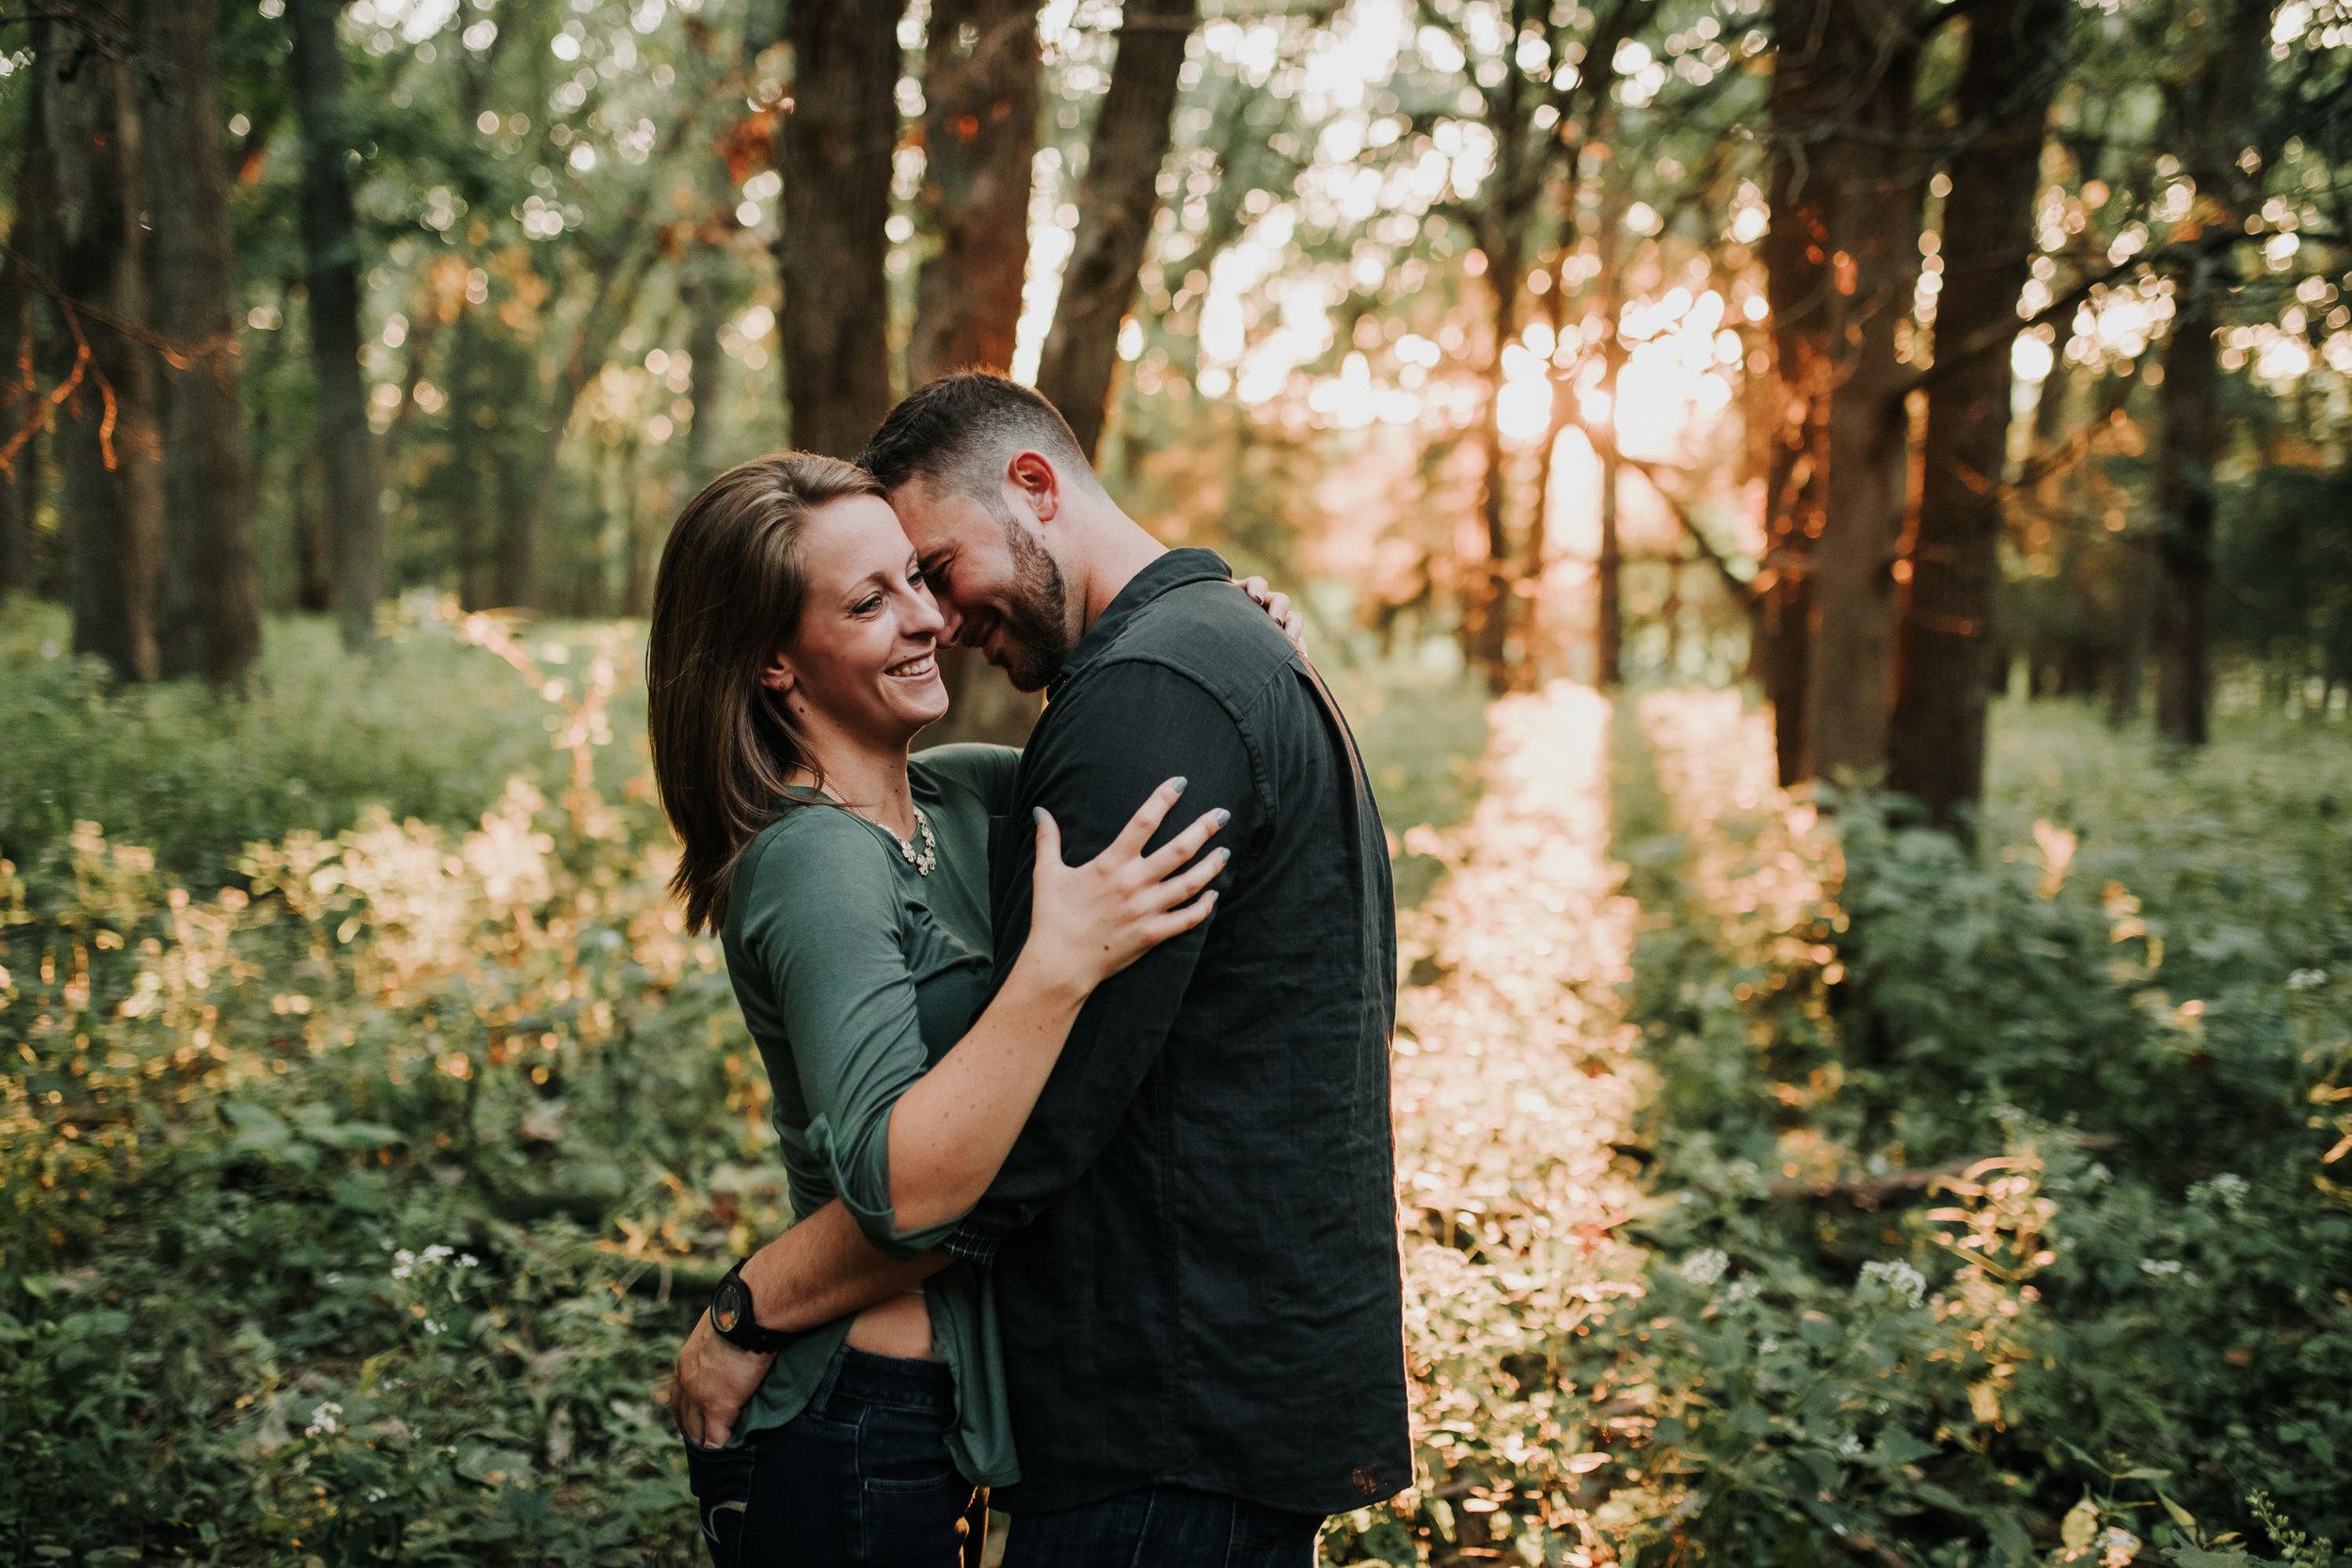 Leslie & Austin - Engaged - Nathaniel Jensen Photography - Omaha Nebraska Wedding Photograper - Engagement Session-89.jpg